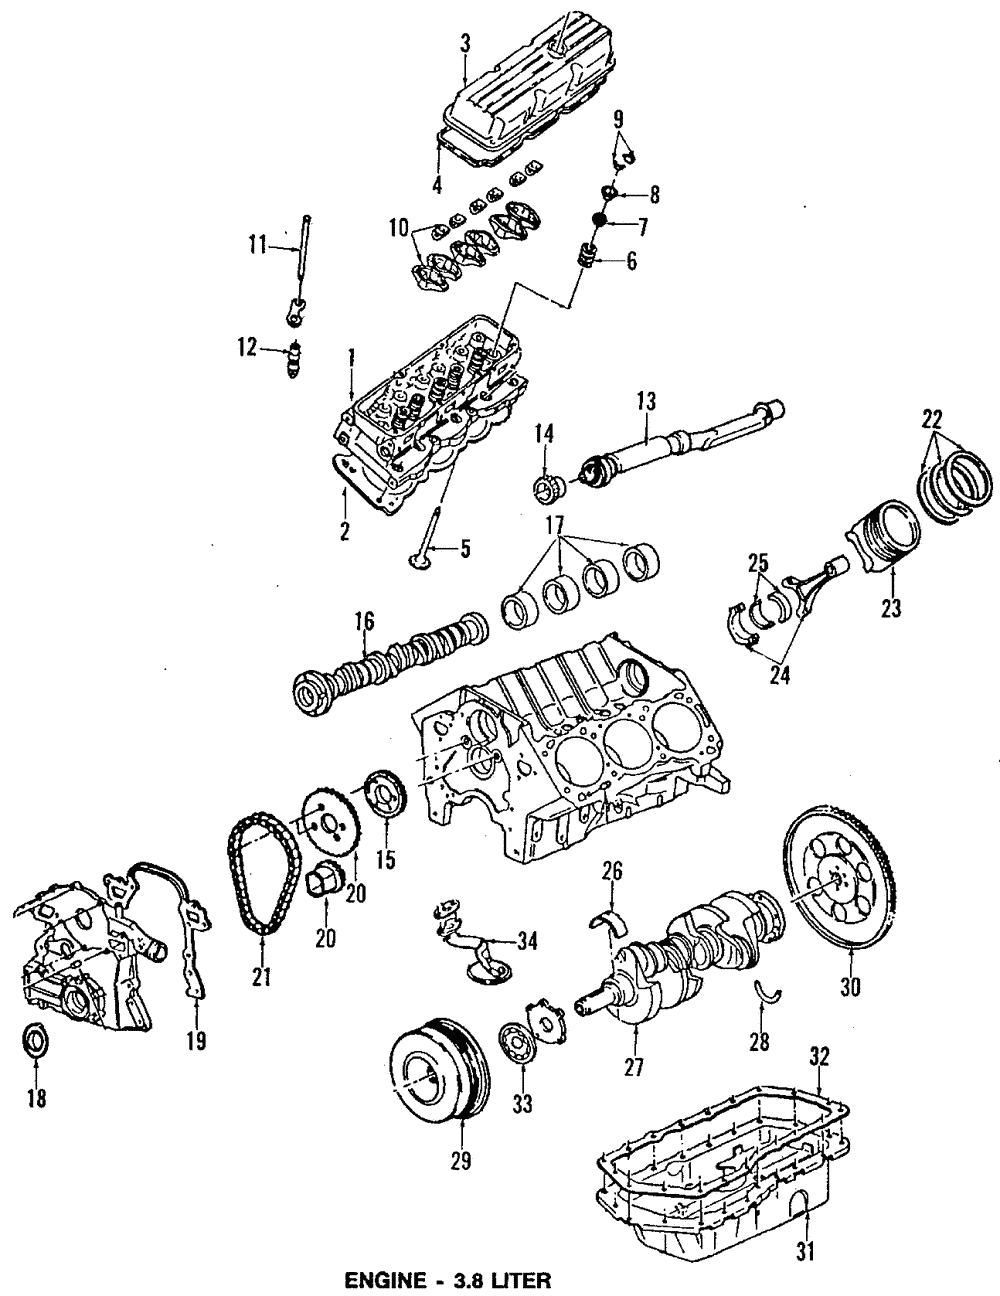 Genuine Gm Pistons 12537198 Ebay Diagram Of Auto Engine Piston